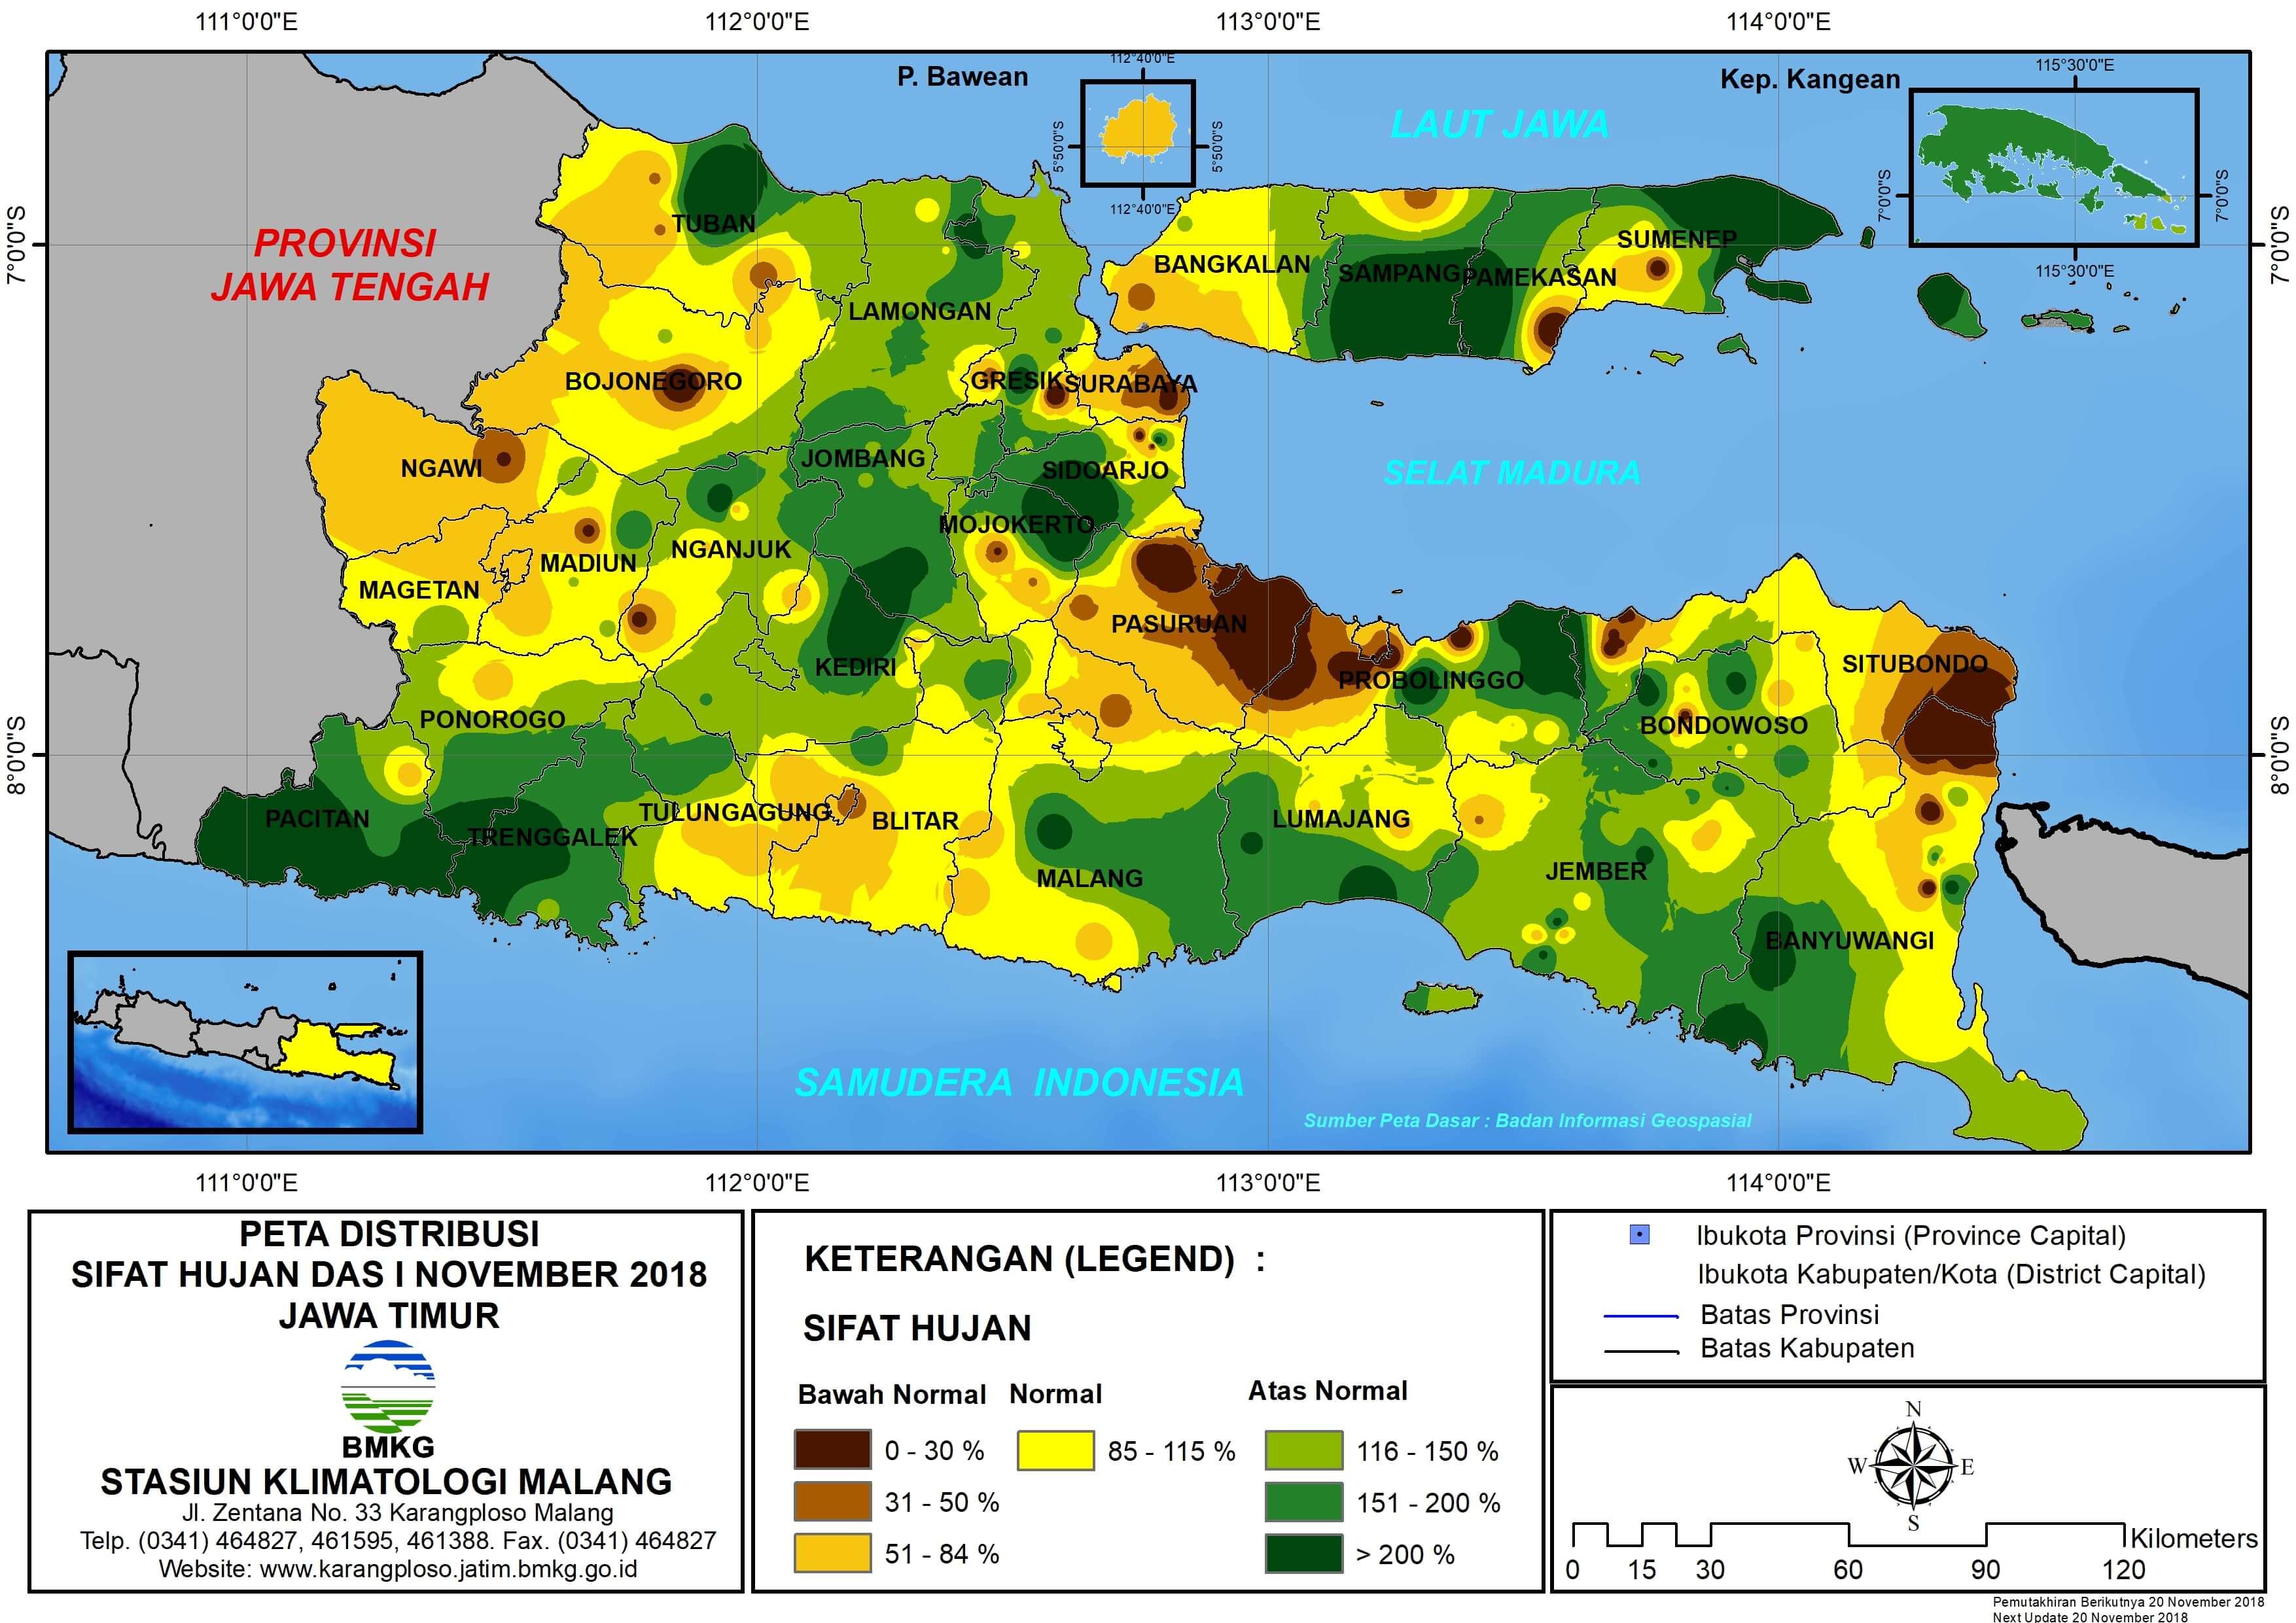 Analisis Distribusi Sifat Hujan Dasarian I November 2018 di Provinsi Jawa Timur